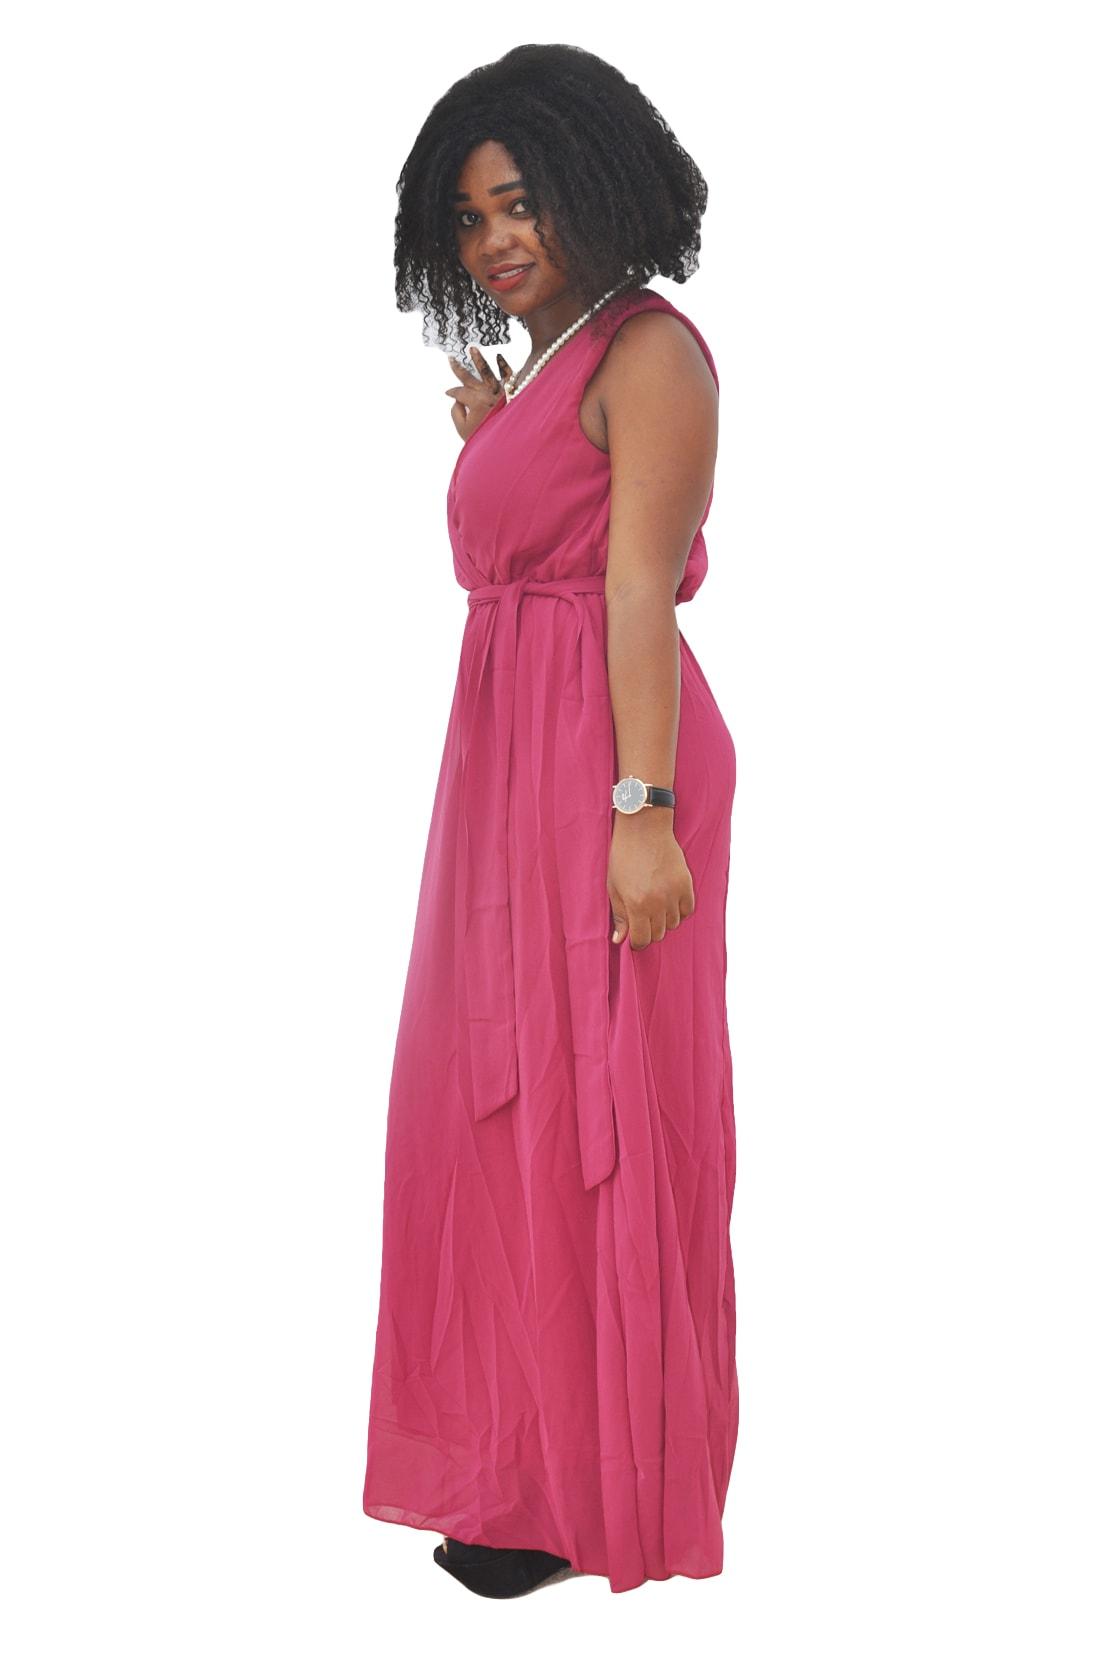 M0297 winered3 Bohemian Dresses maureens.com boutique